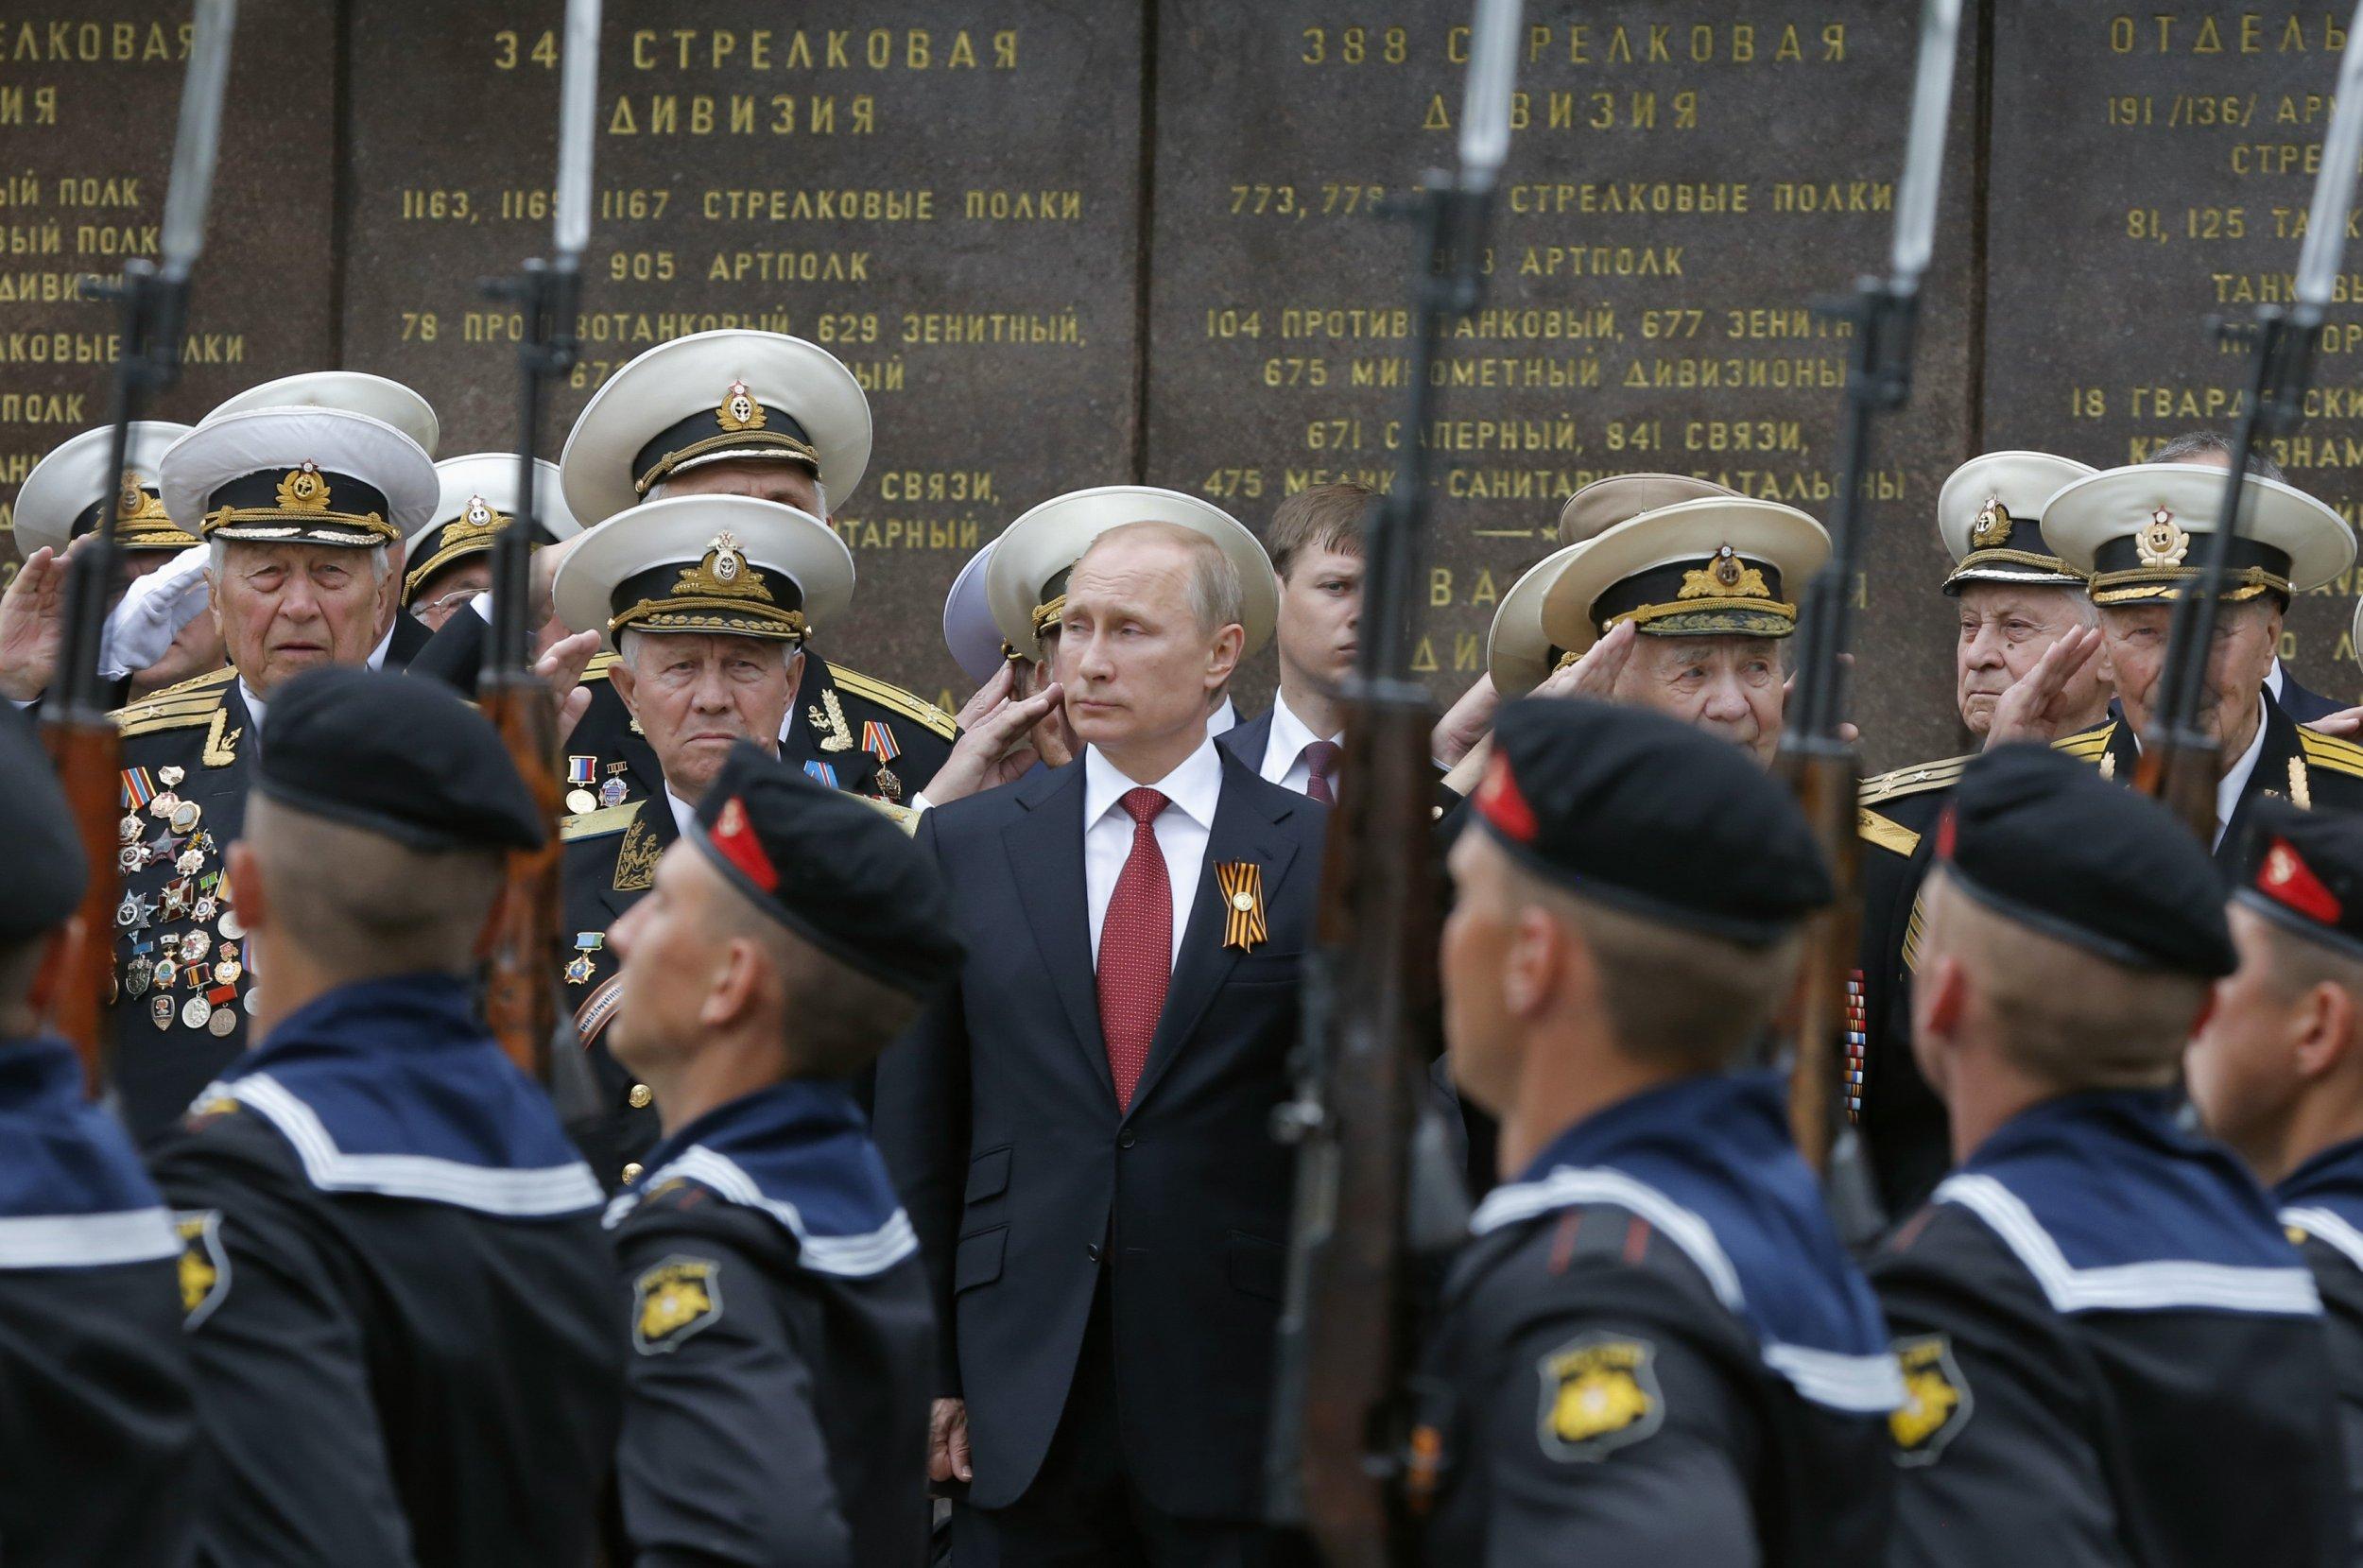 03_21_Putin_Paranoia_01